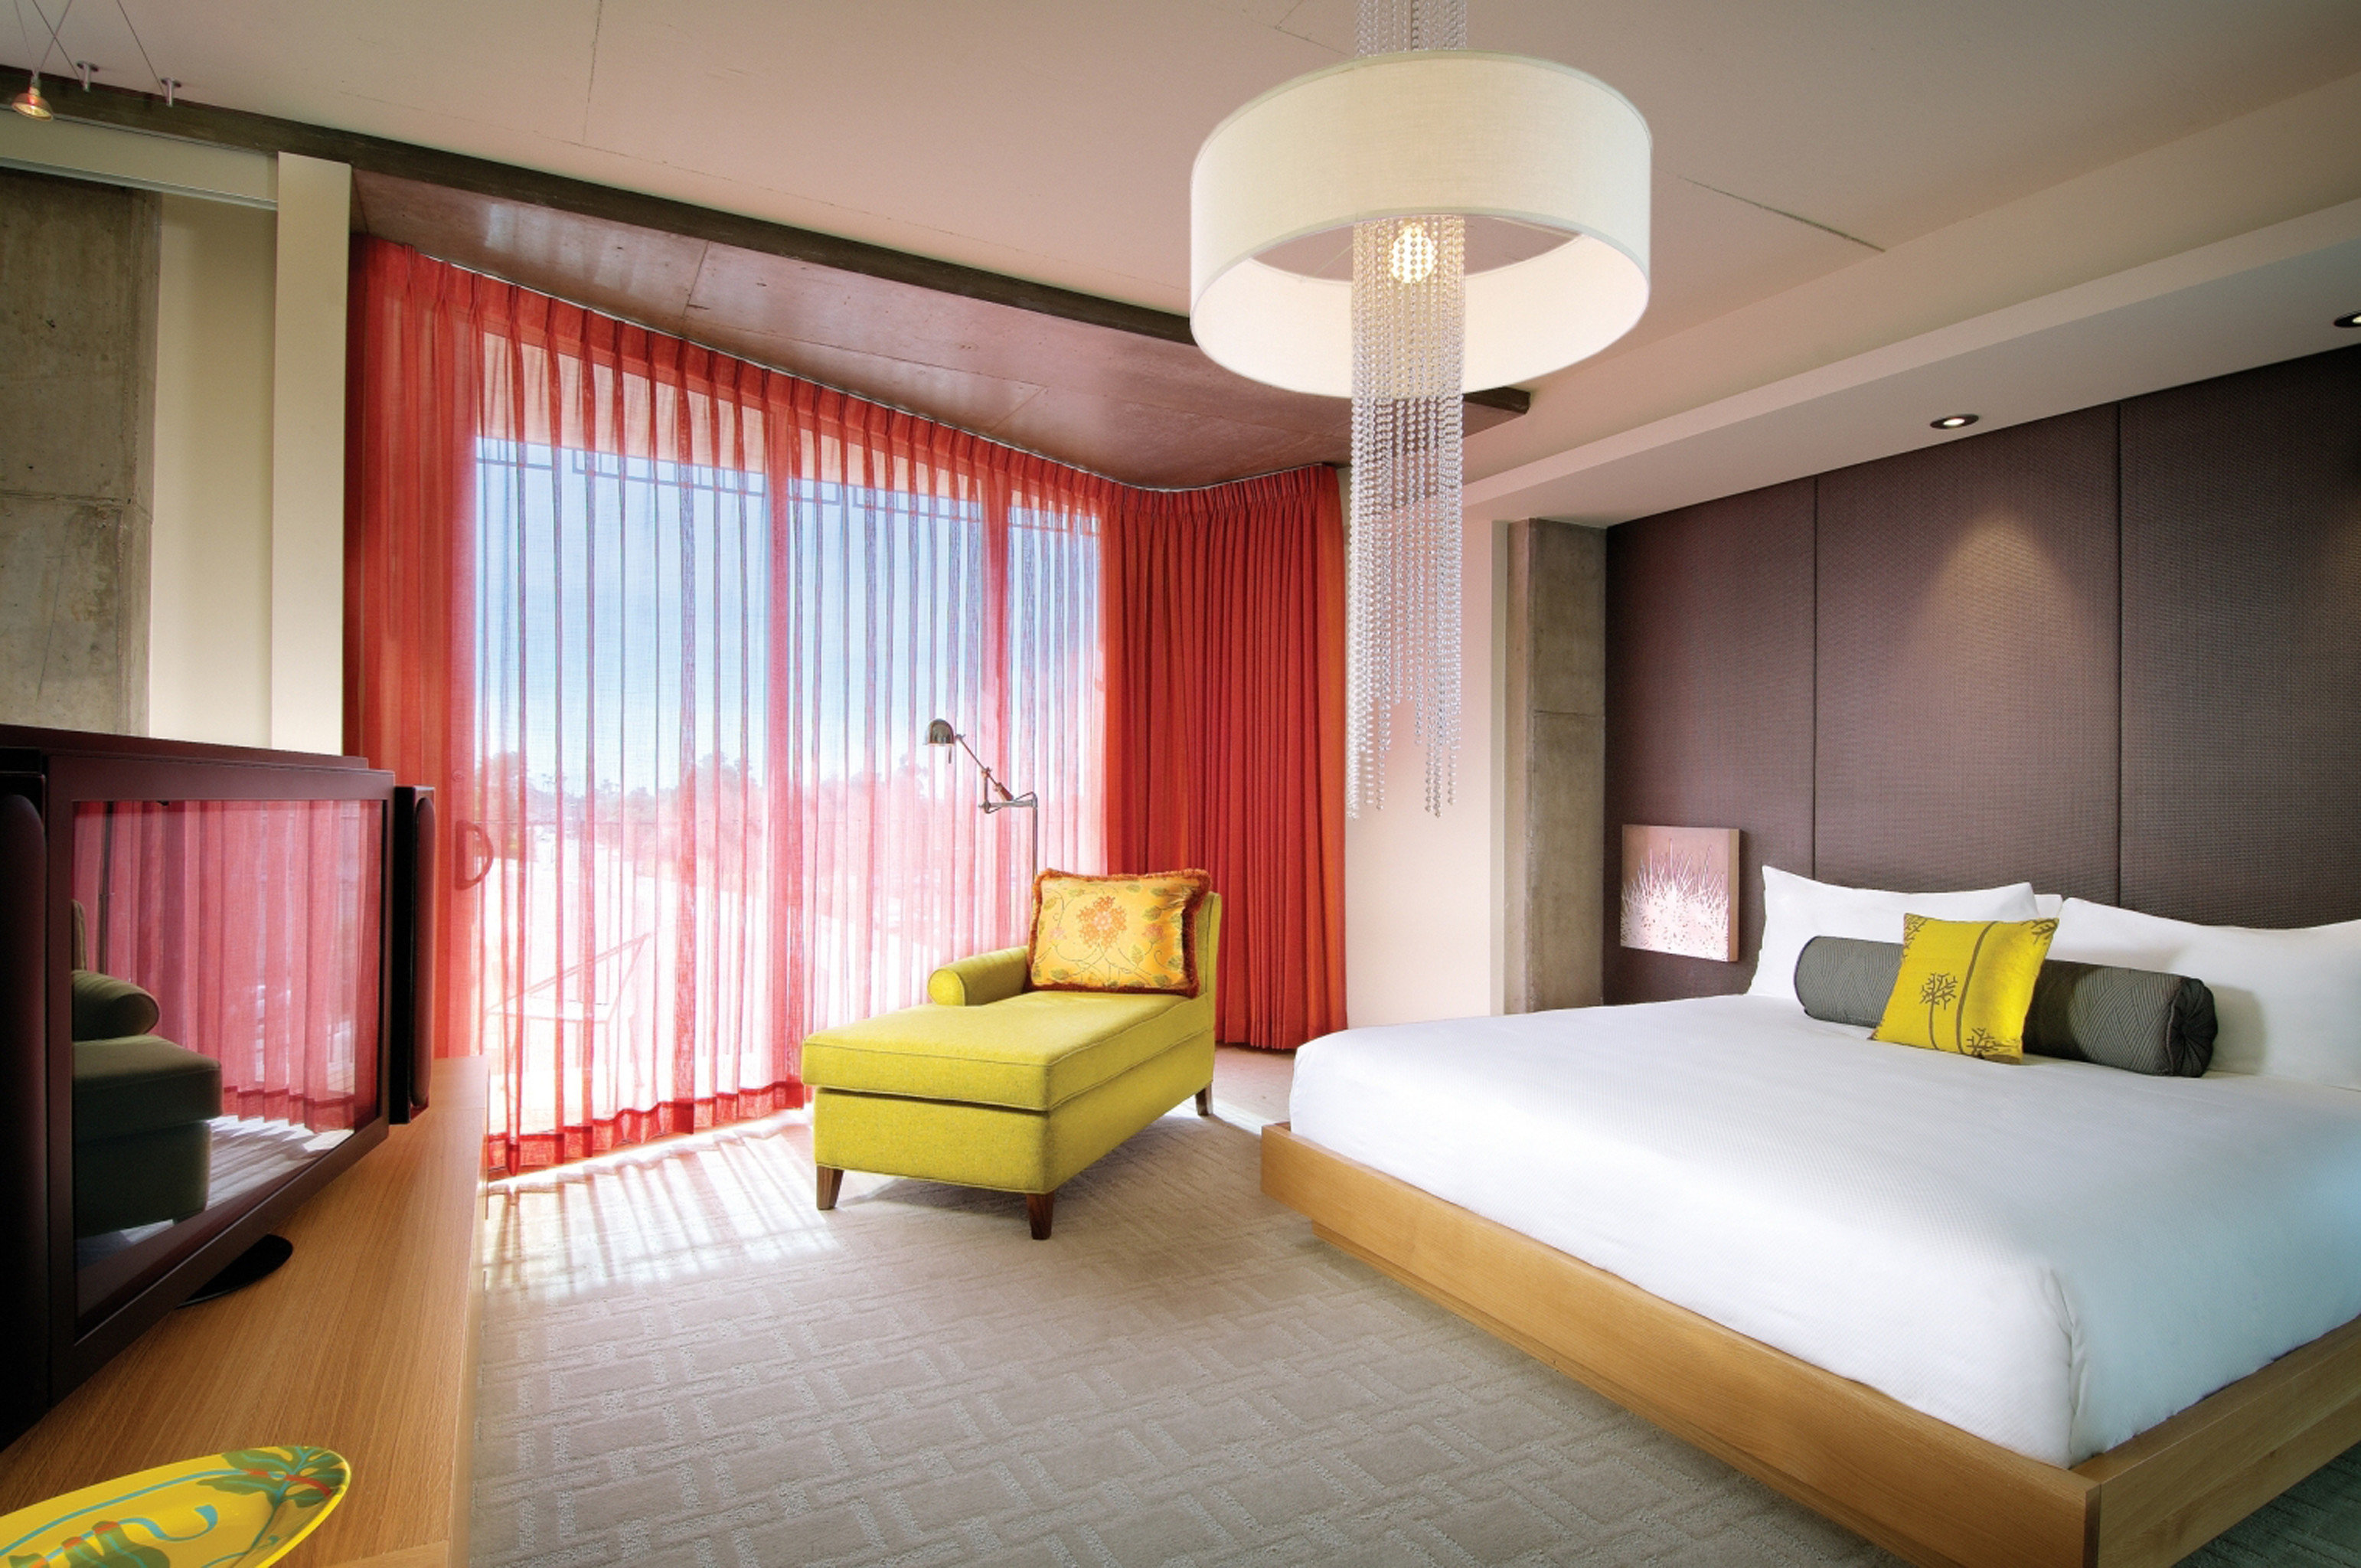 Bedroom Budget Hip Luxury Modern Suite property condominium living room lamp